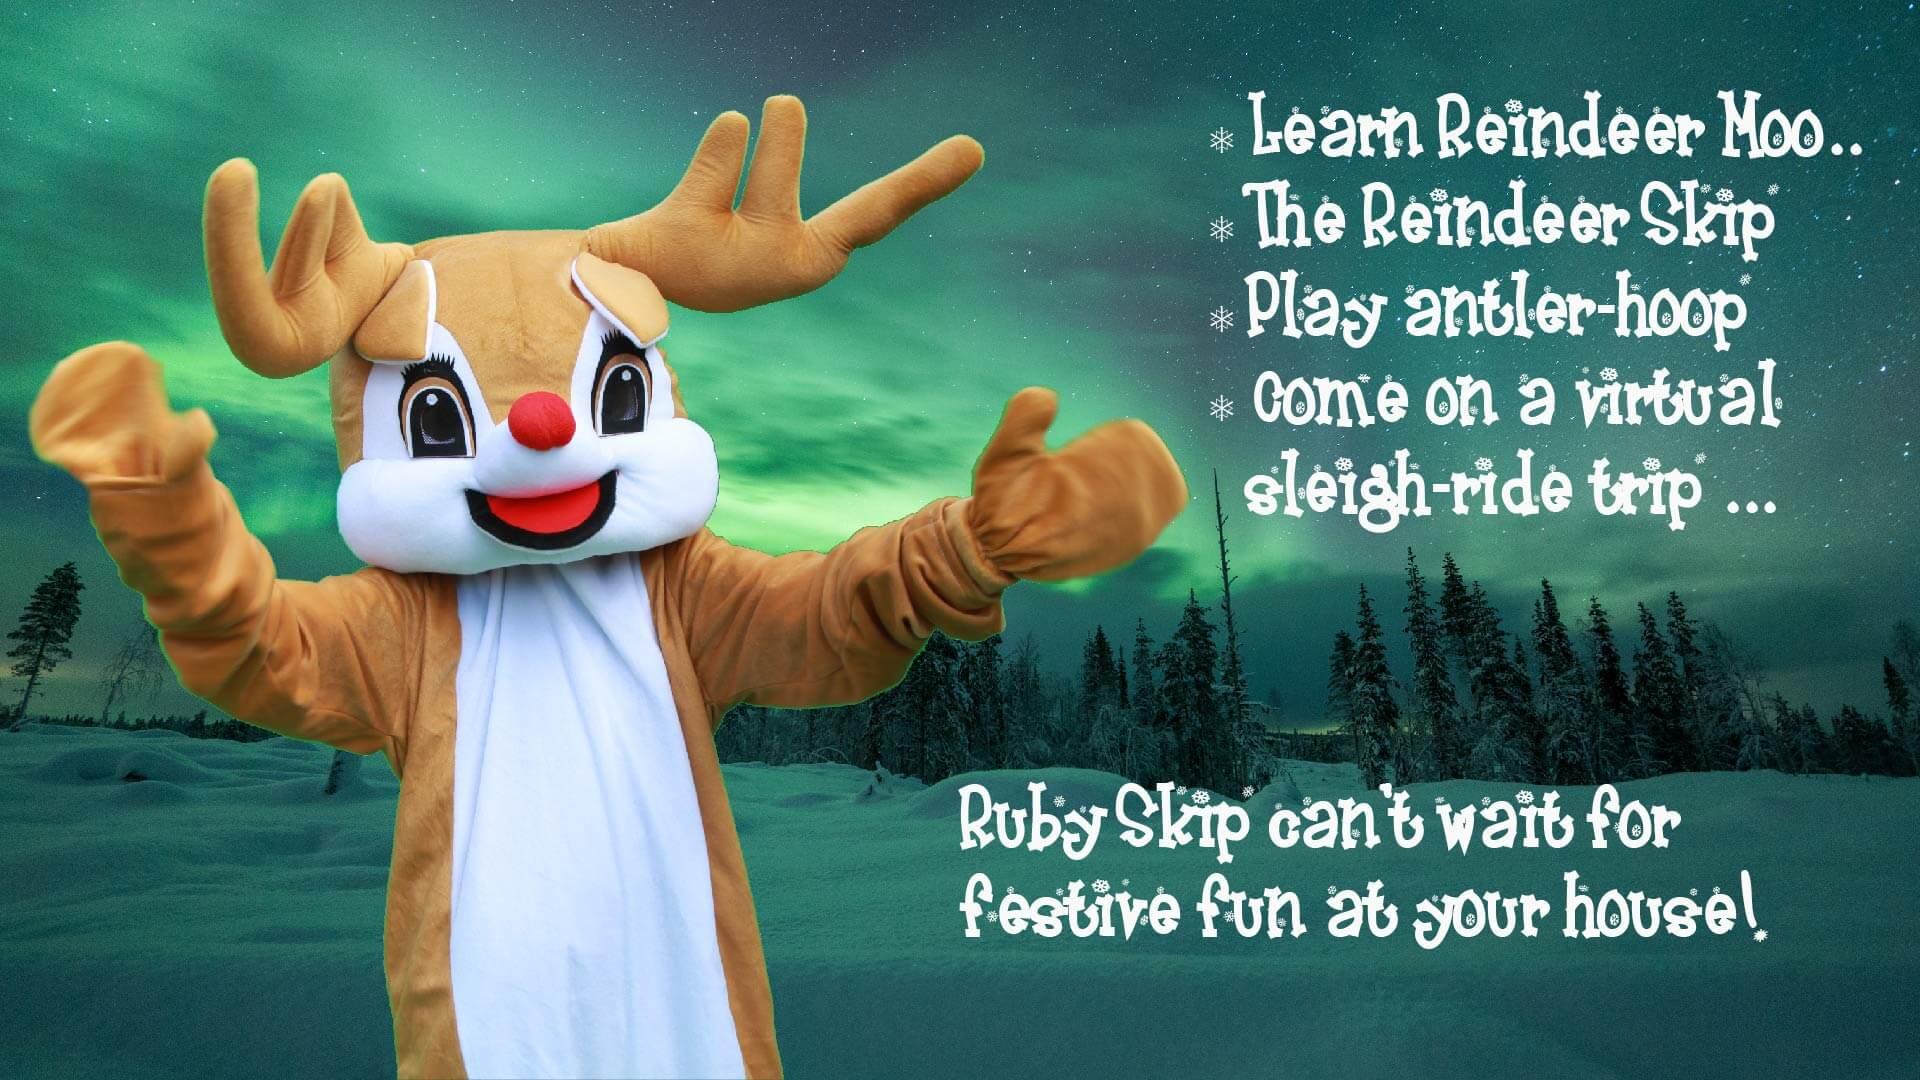 reindeer christmas event for kids